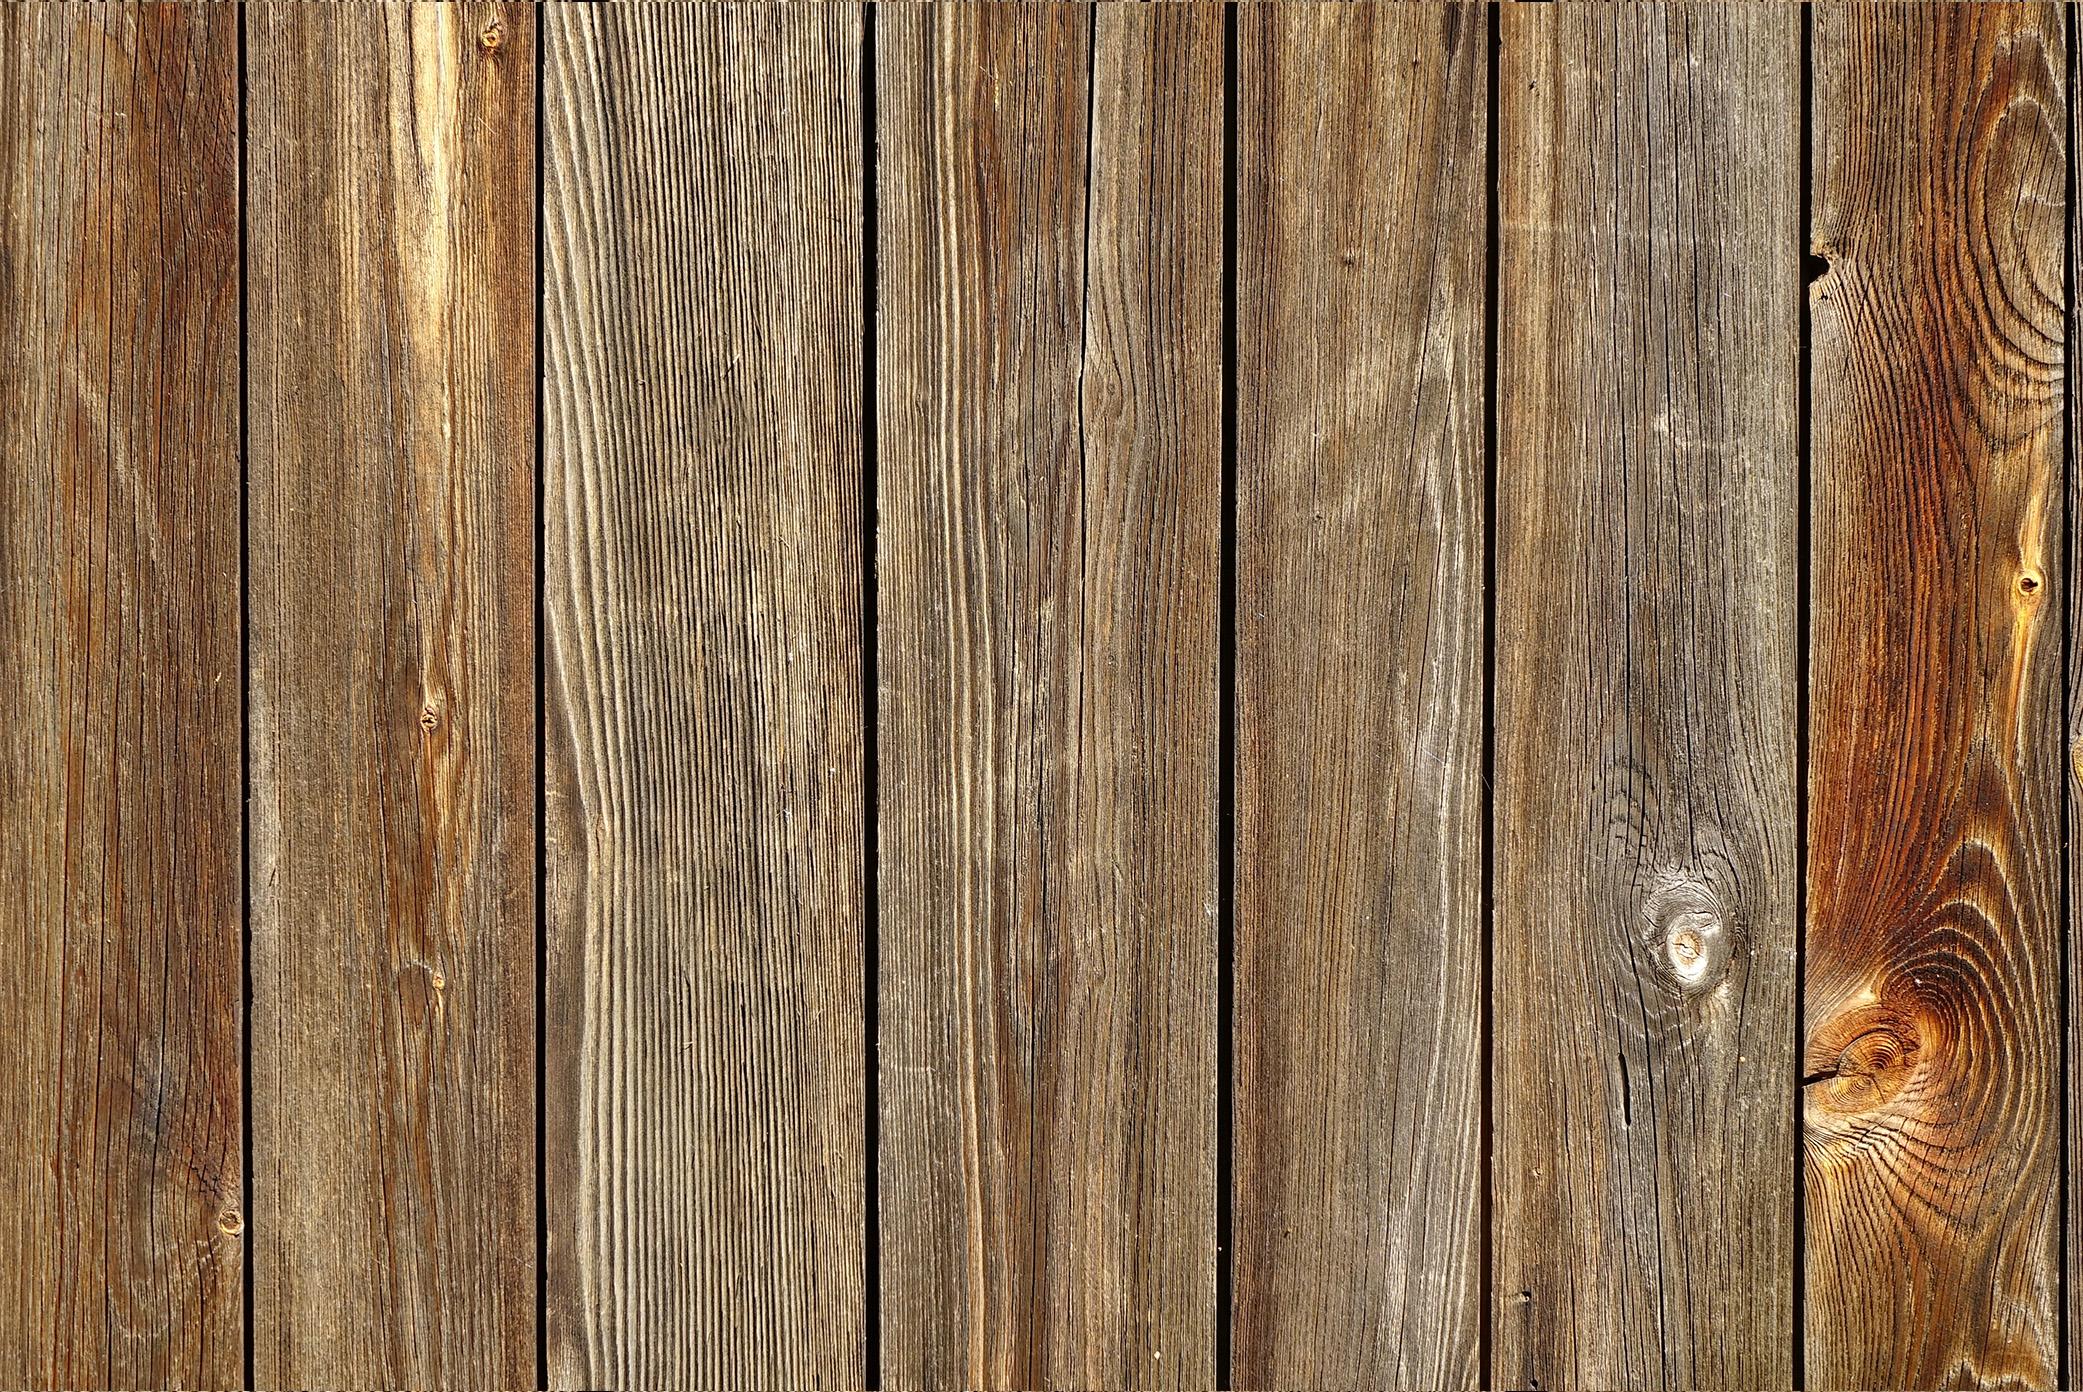 Vertical Barn Wooden Wall Planking Texture. Horizontal Brown Woo-1.jpg